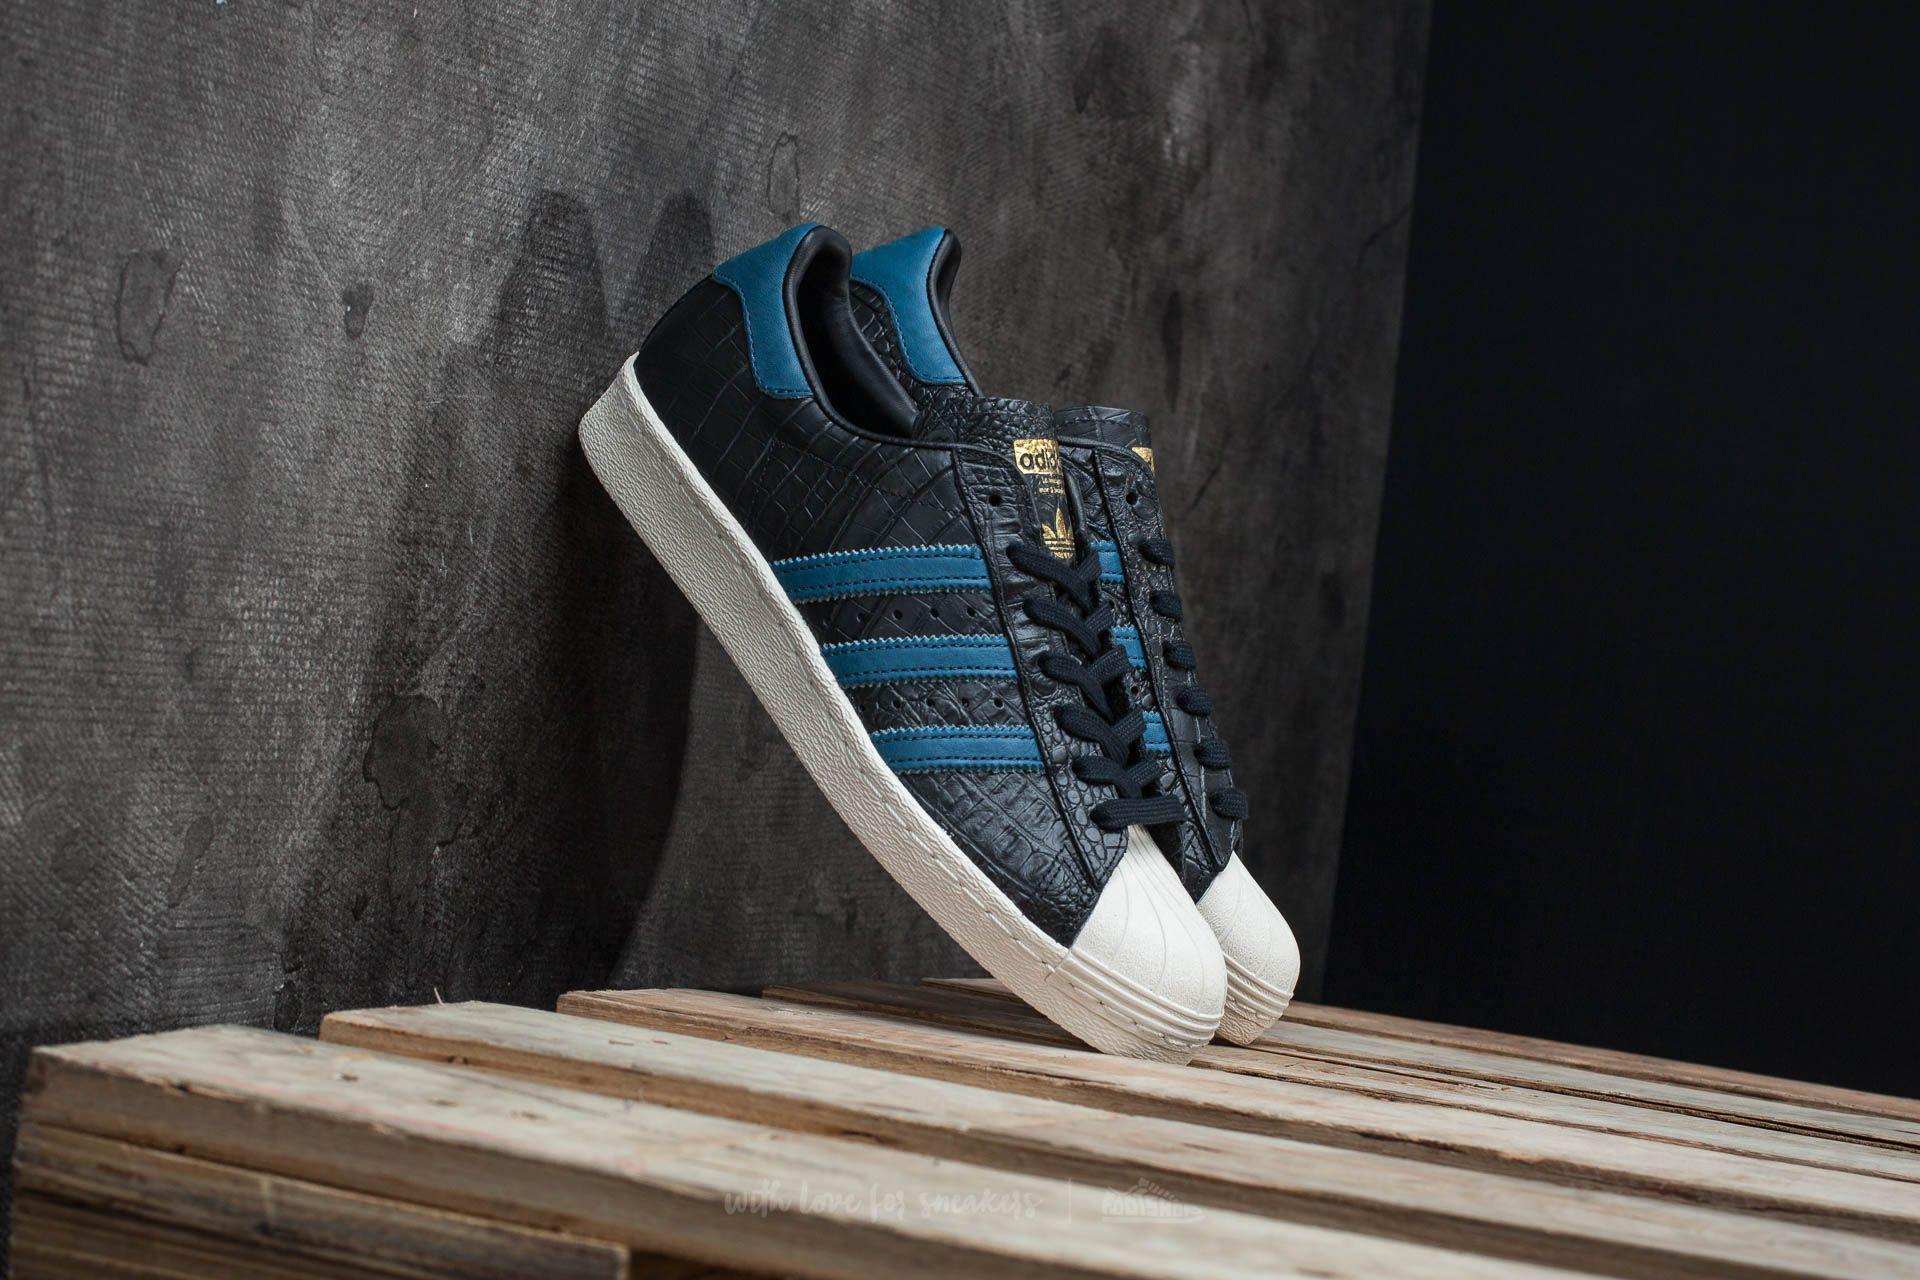 new concept be167 3eada adidas-originals--Adidas-Superstar-80s-Core-Black-Blue-Gold-Metallic.jpeg